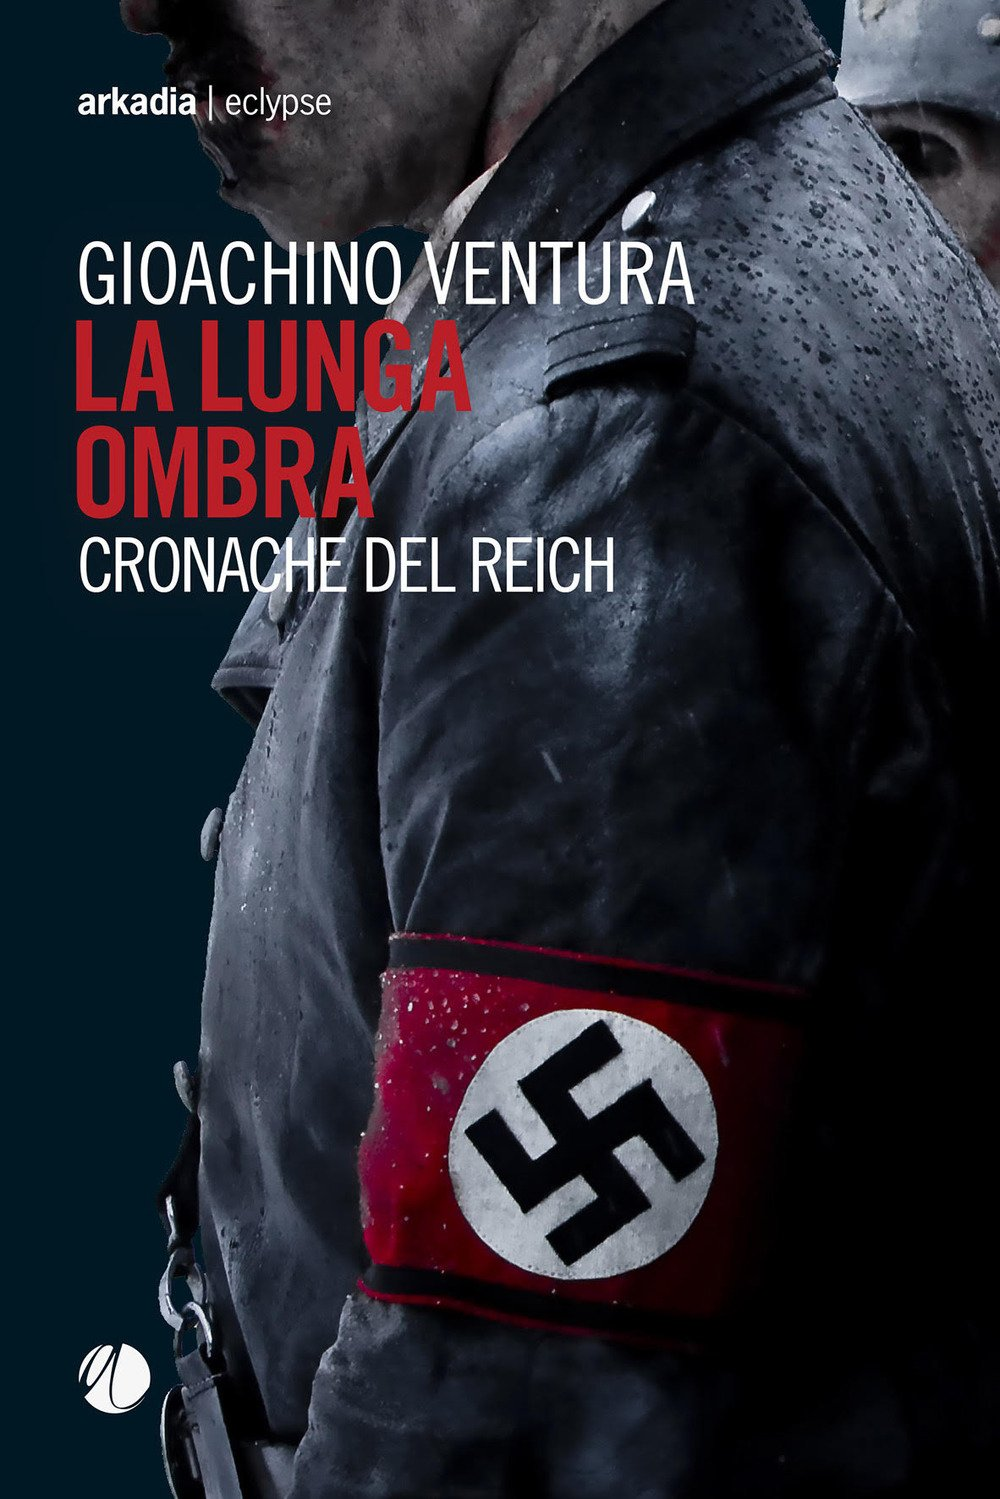 La lunga ombra – Gioachino Ventura